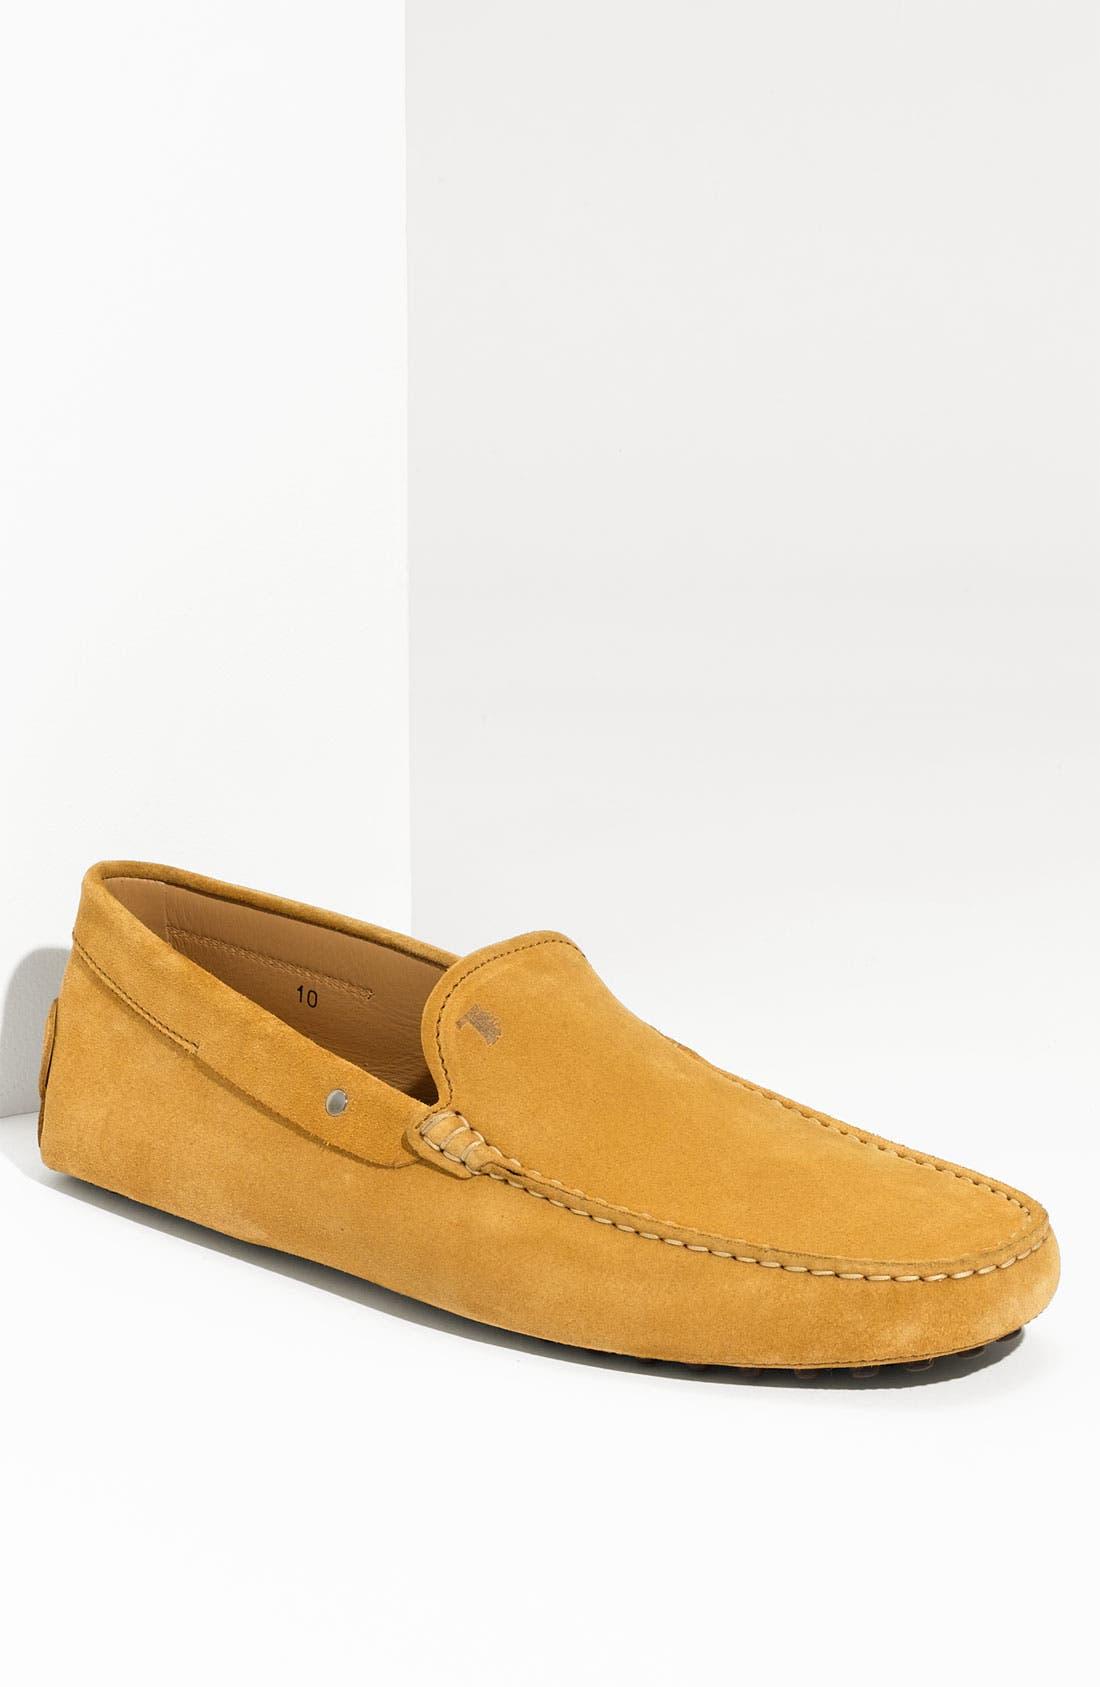 Main Image - Tod's 'Gommini' Venetian Driving Shoe